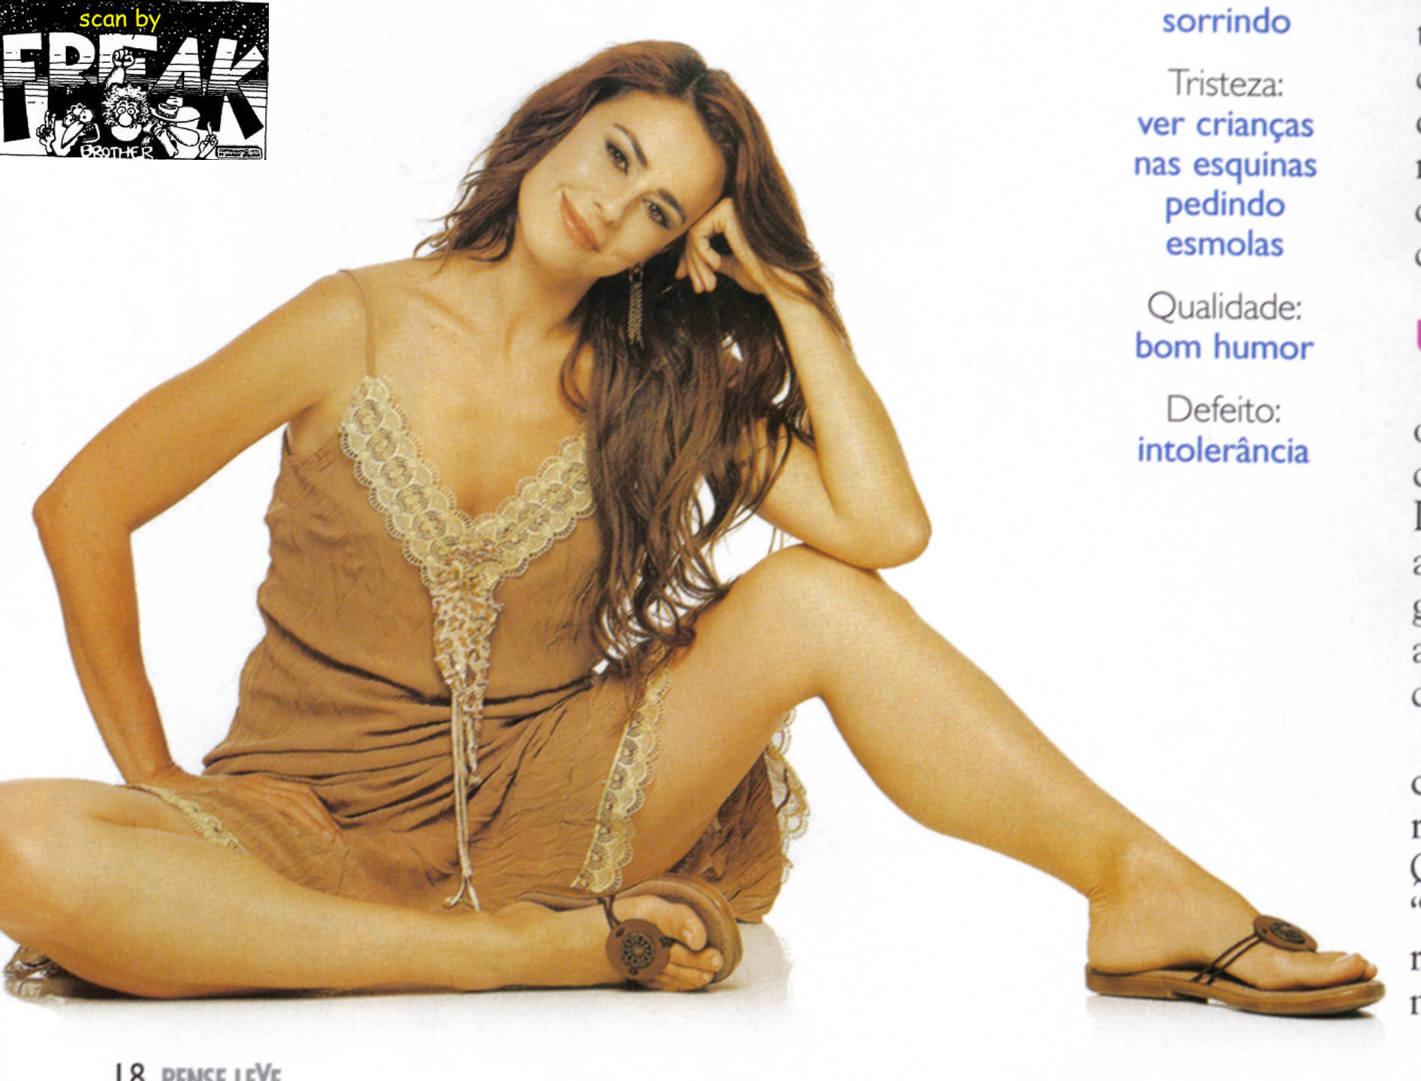 http://pics.wikifeet.com/Daniela-Escobar-Feet-491956.jpg